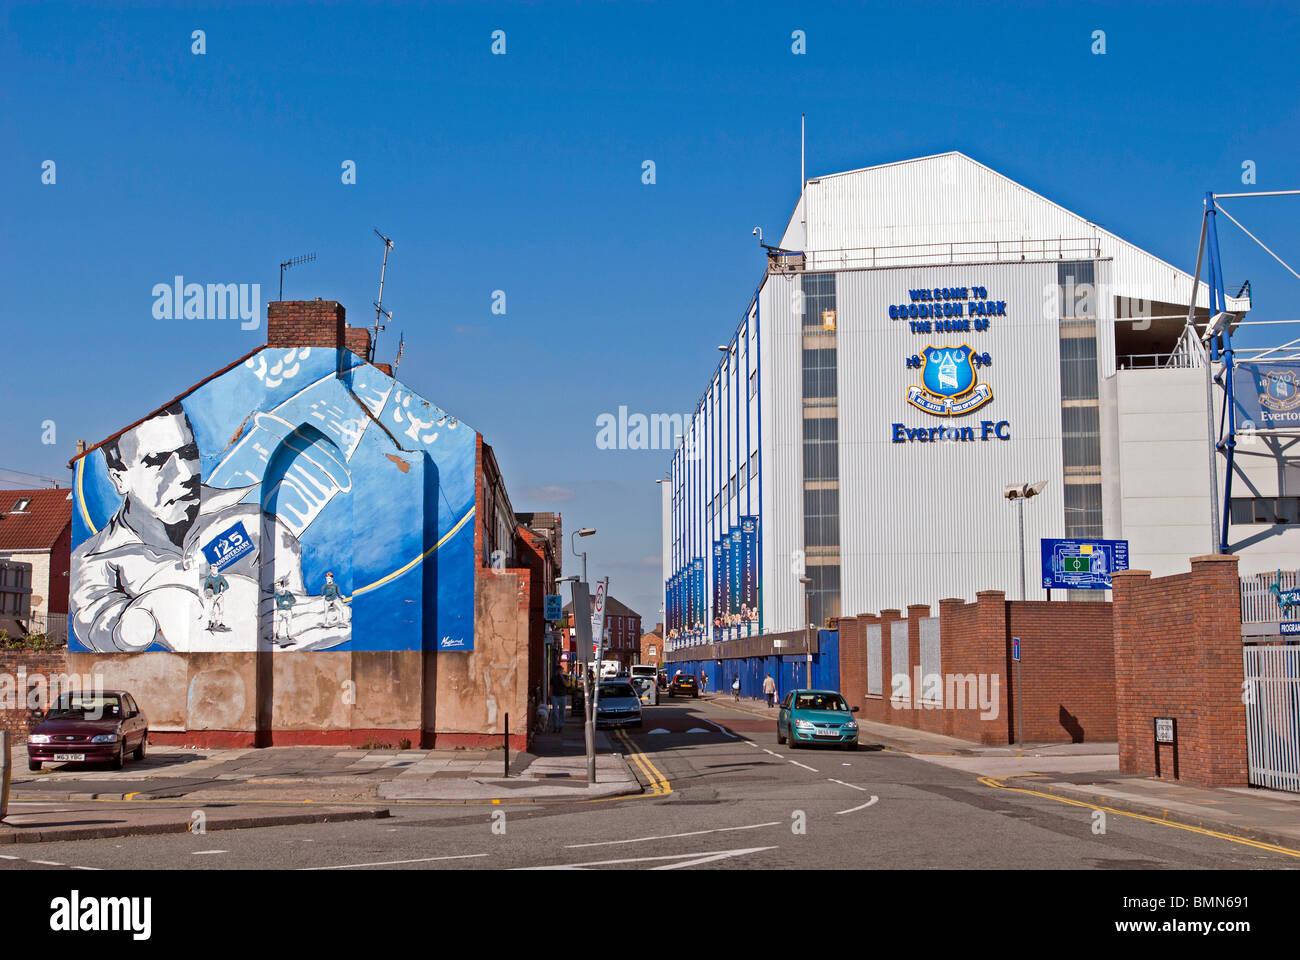 Goodison Park Liverpool home of Everton football club. Stock Photo